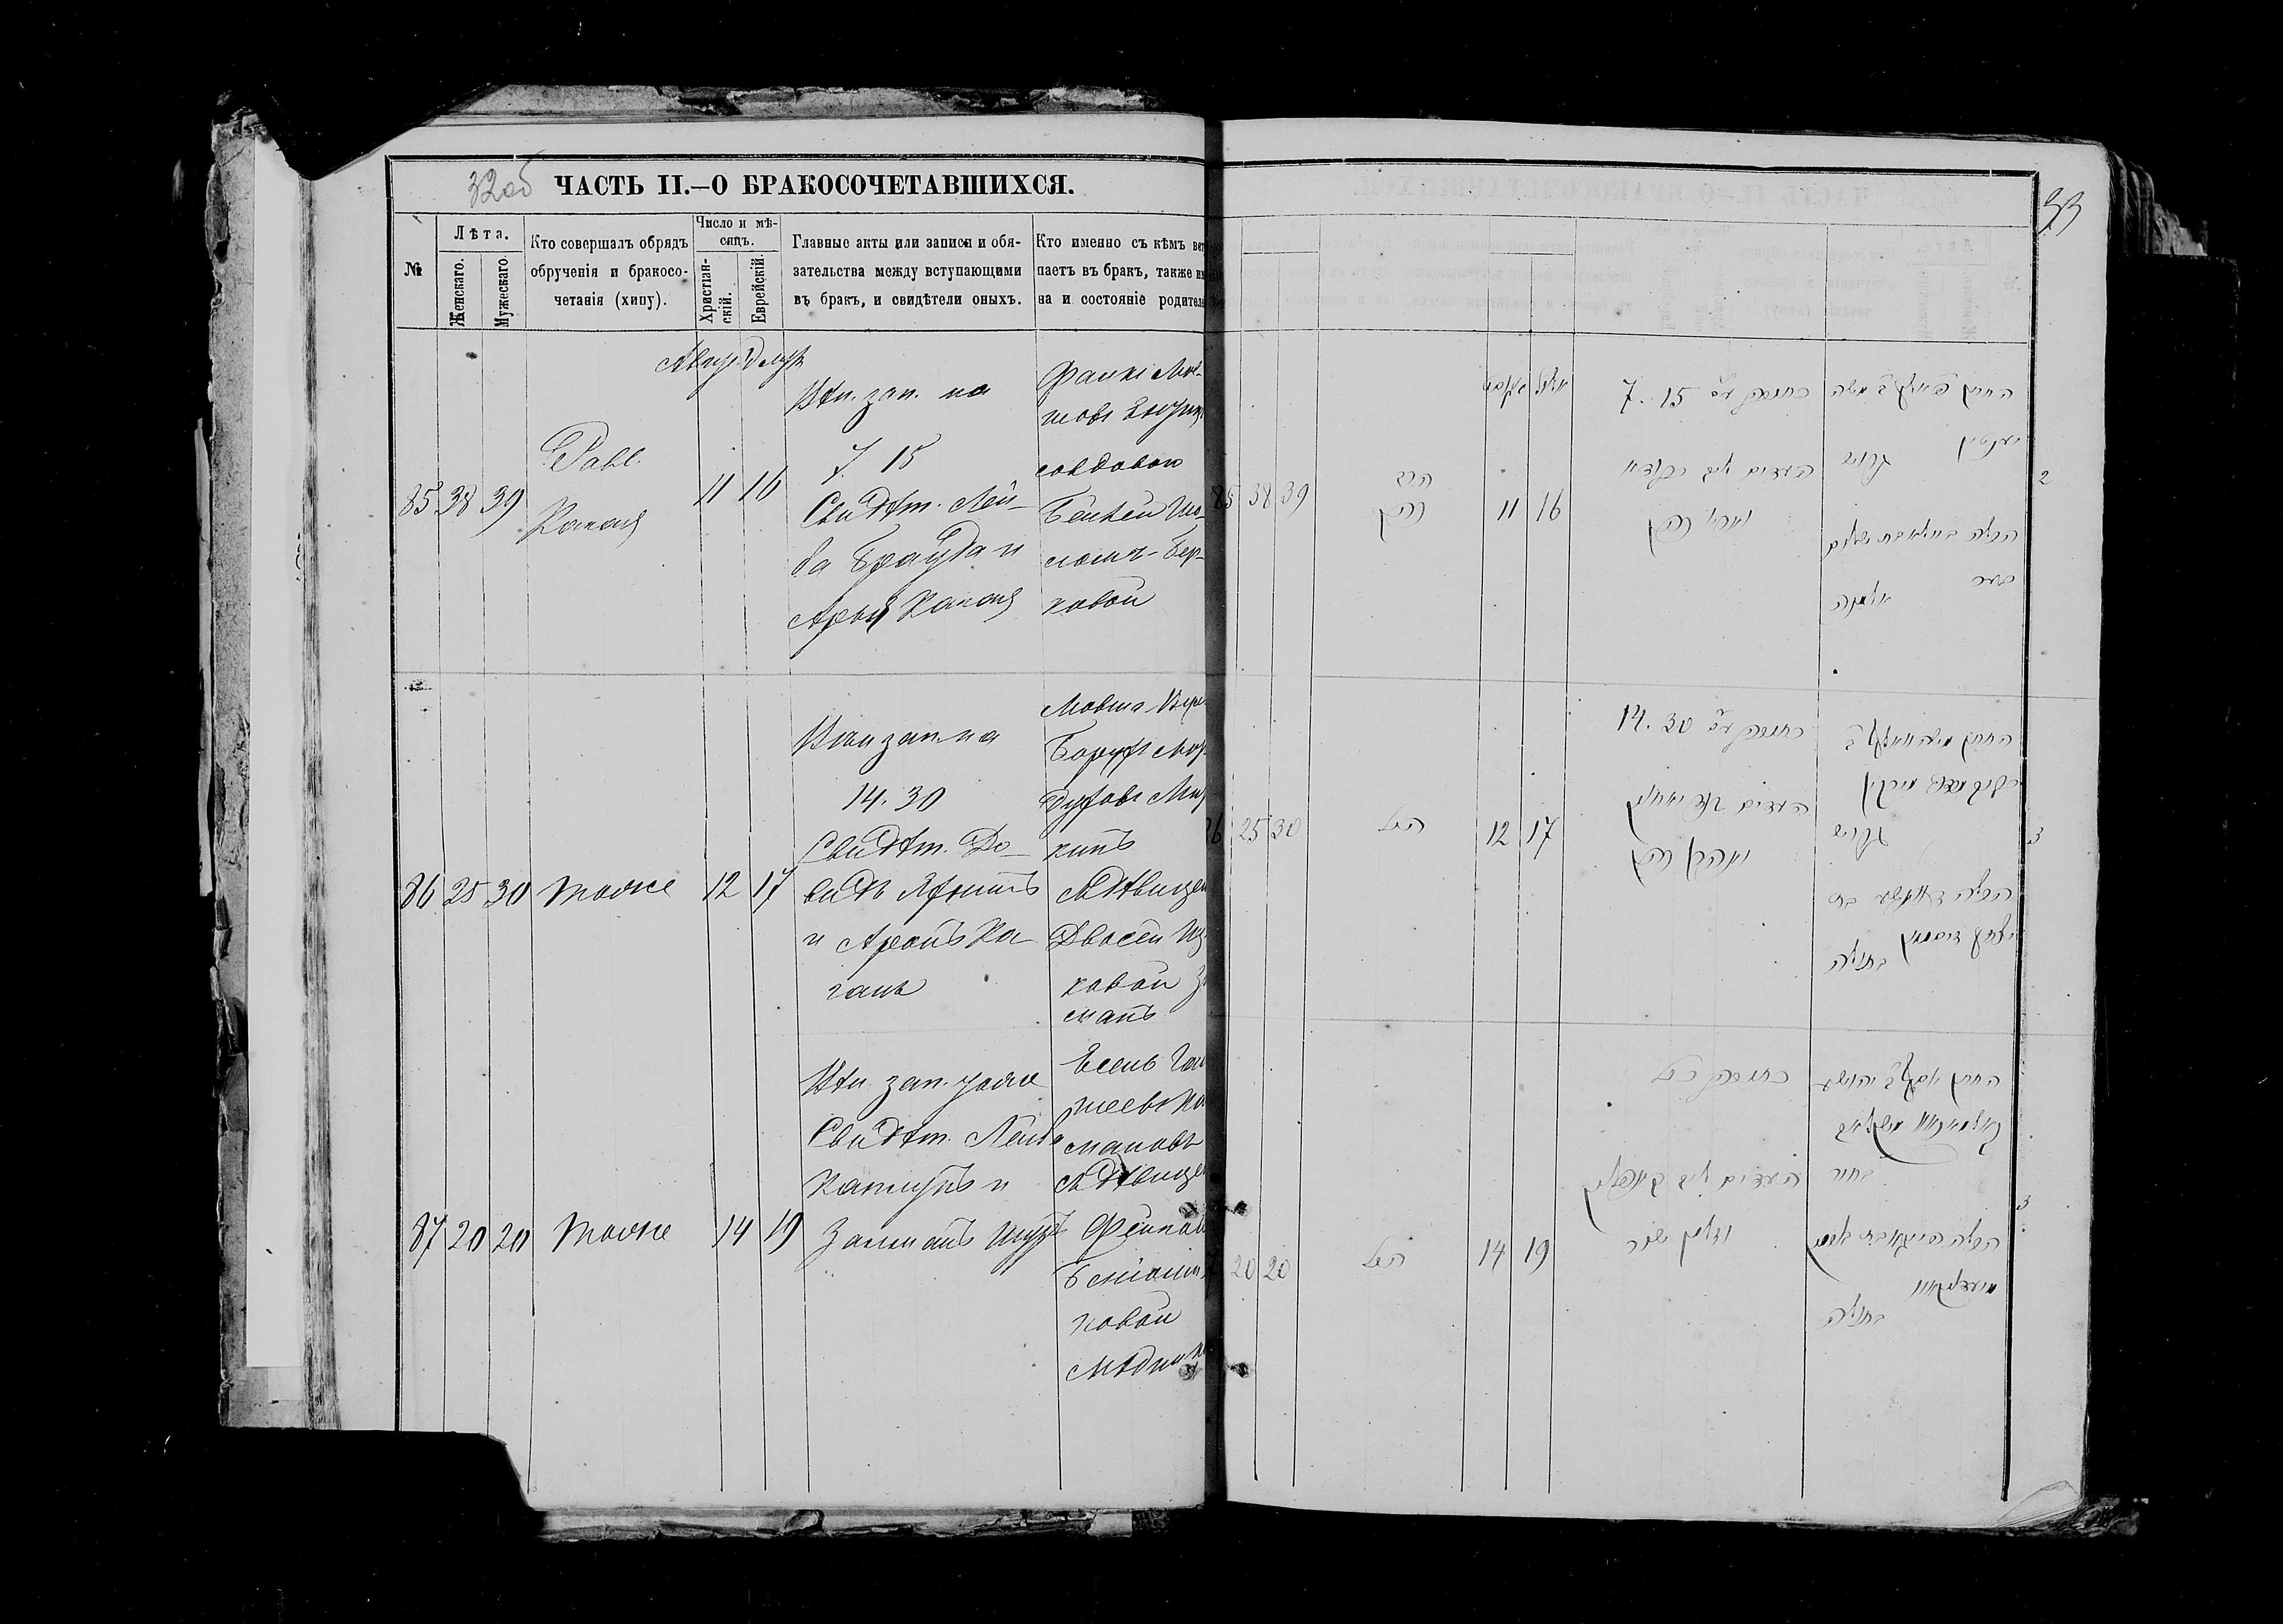 Мовша-Вульф Борух-Мордухович Миркин с Двосей Зисман 12 августа 1882, запись 86, пленка 007766484, снимок 290